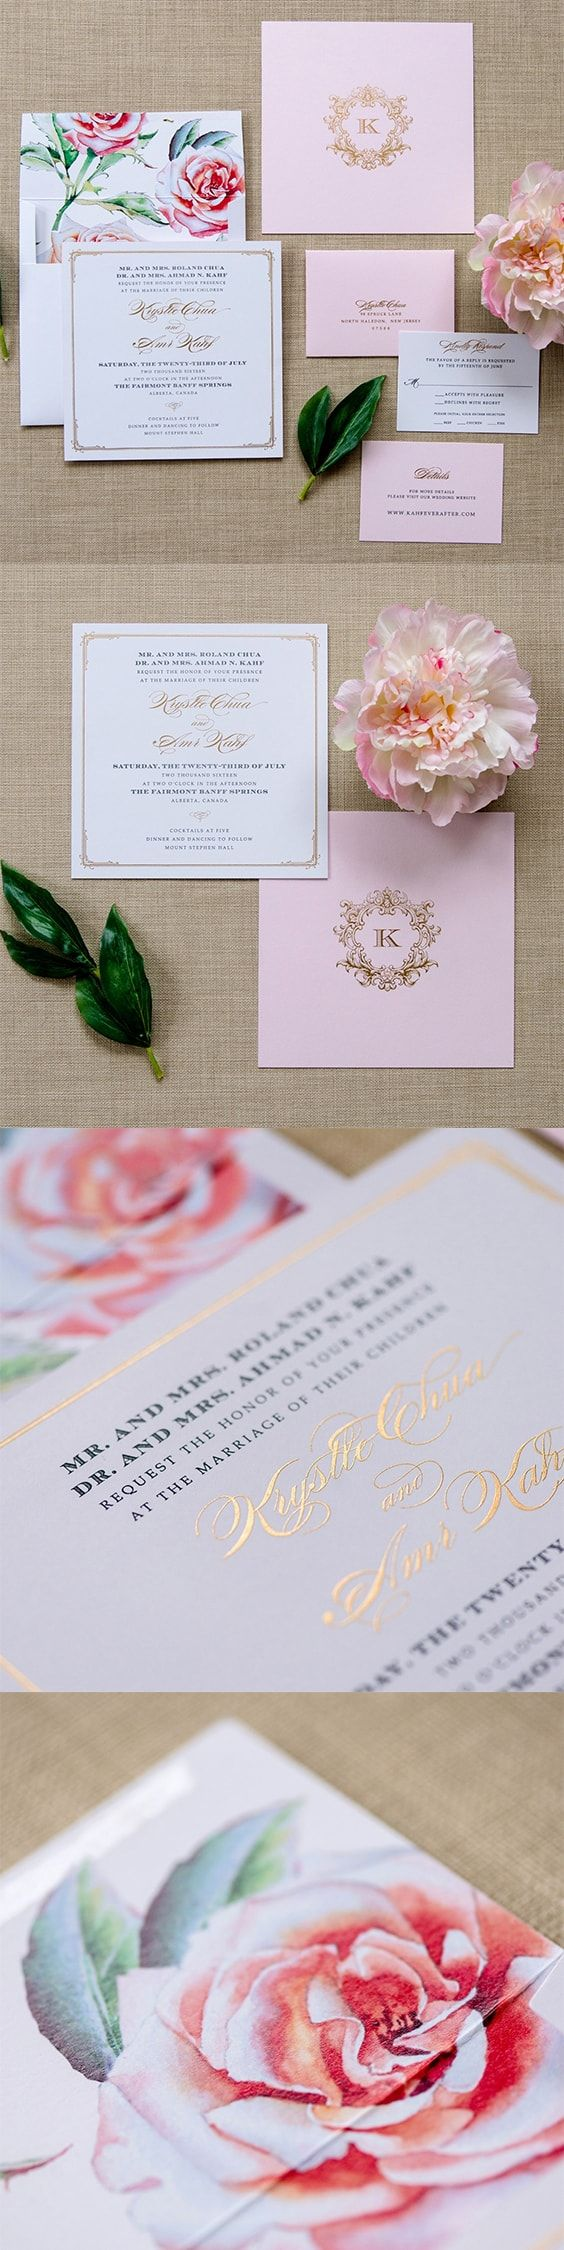 Floral Wedding Invitation - Krystle Wedding Invitation | Floral ...